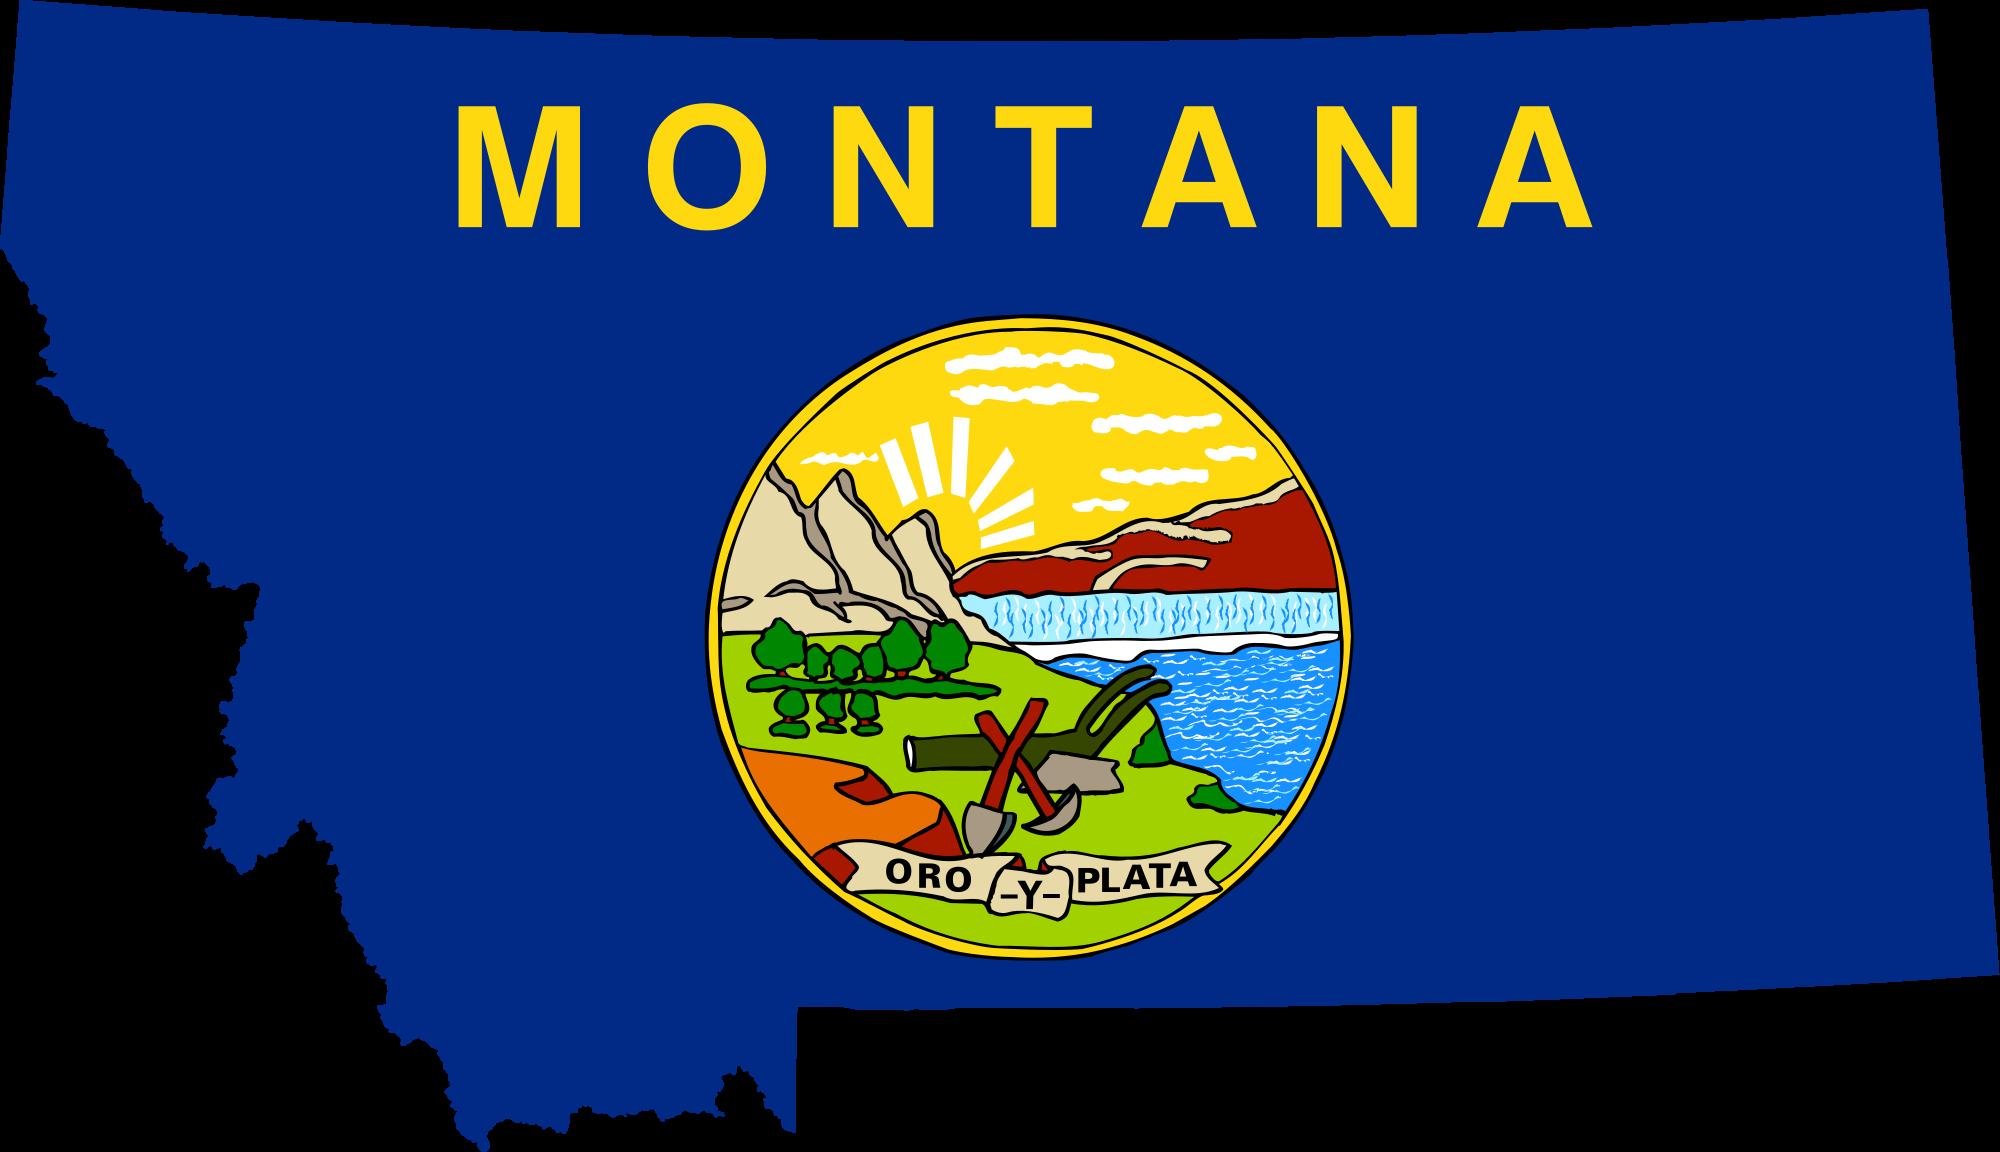 Montana svg #16, Download drawings